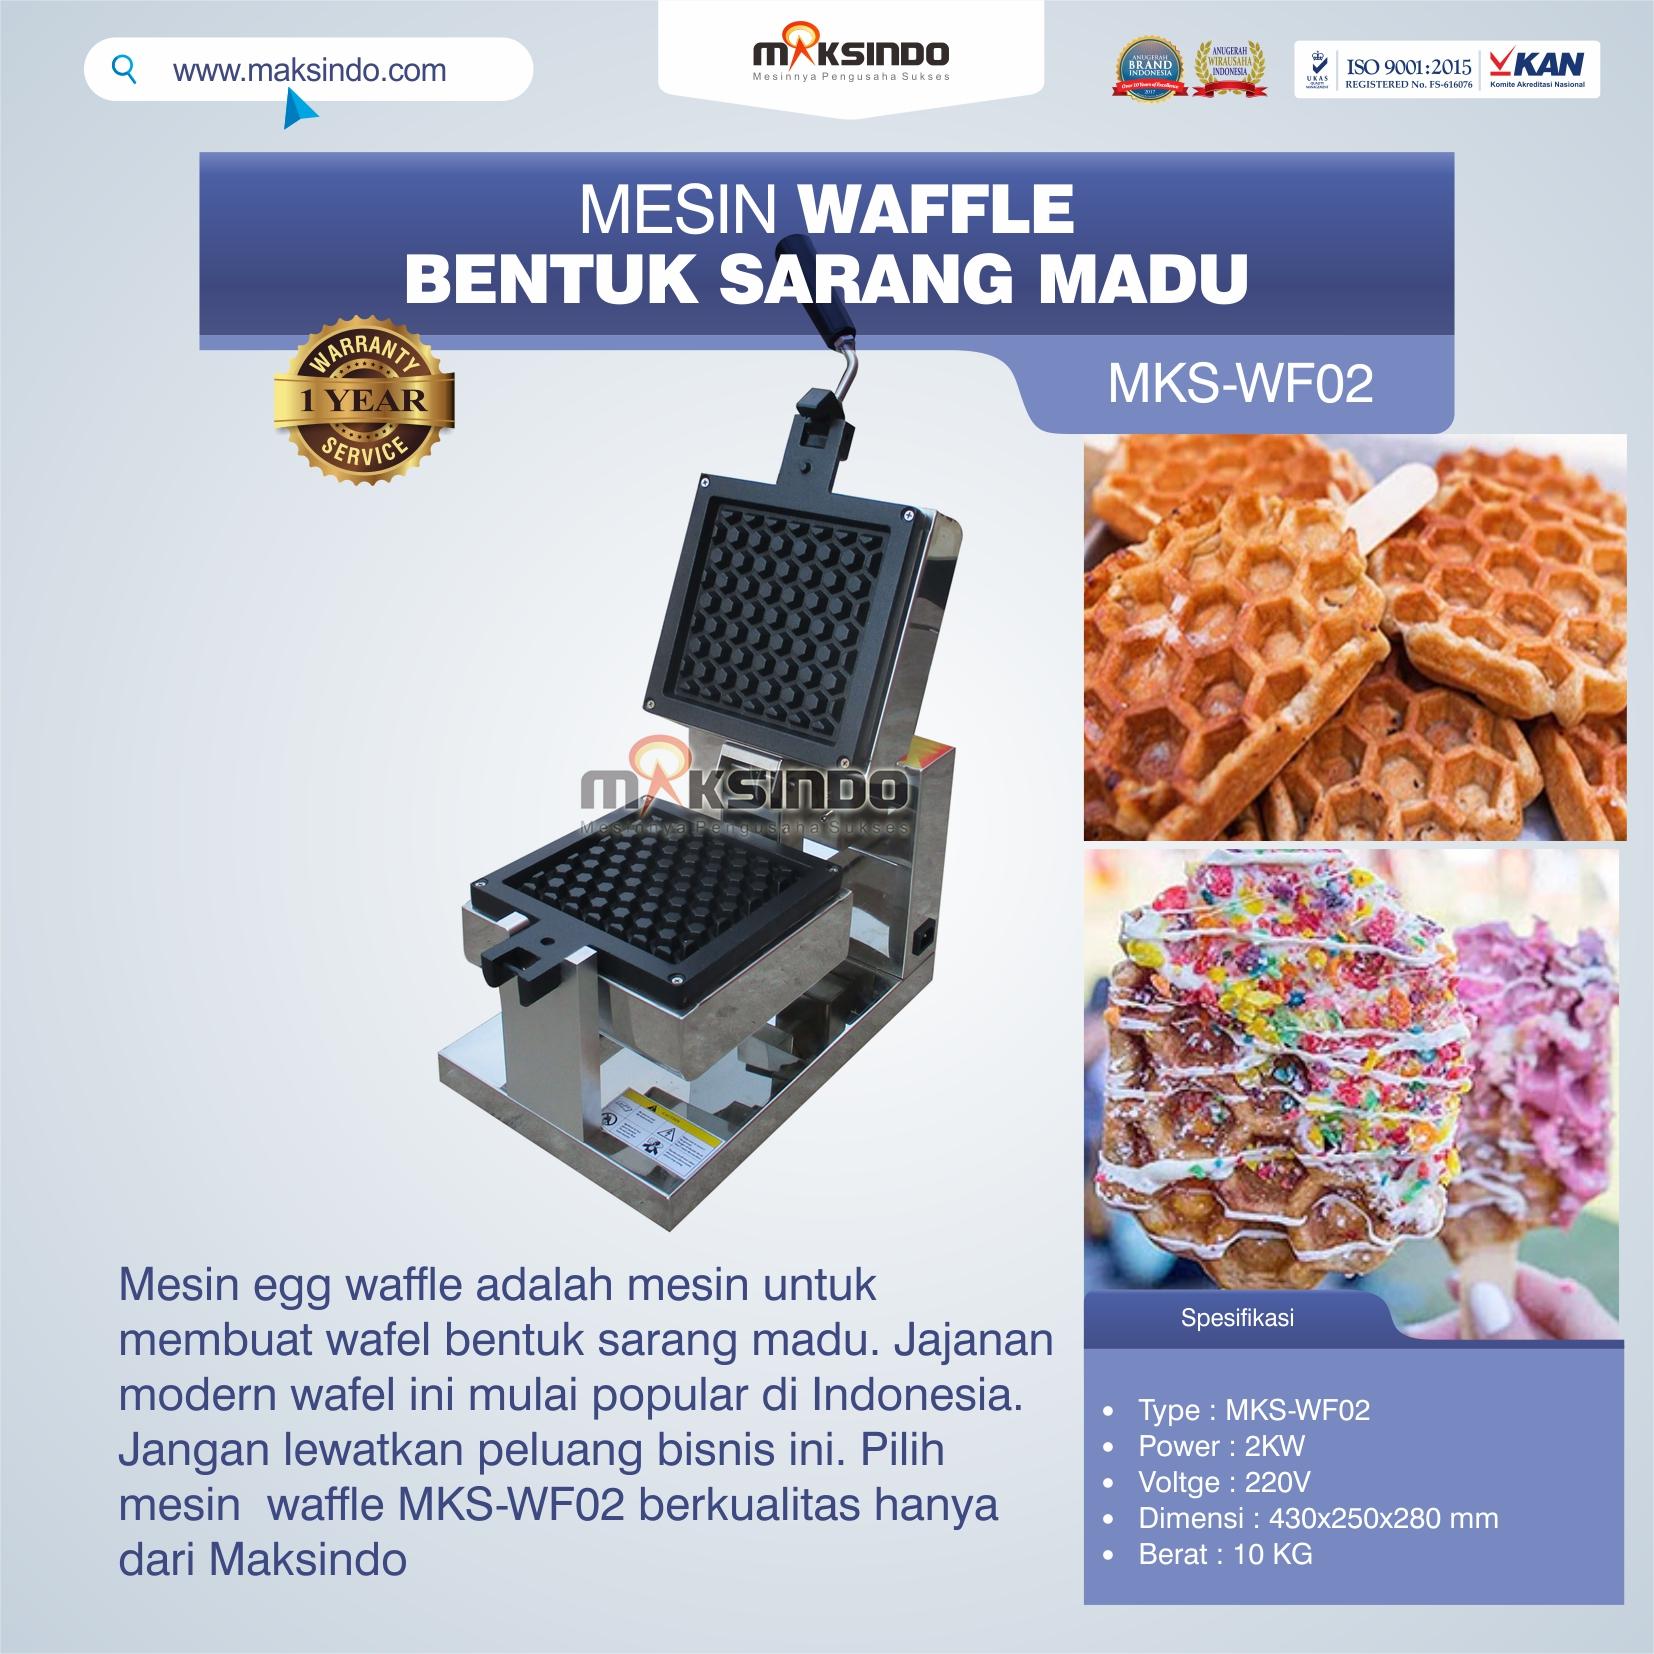 Jual Mesin Waffle Bentuk Sarang Madu MKS-WF02 di Makassar